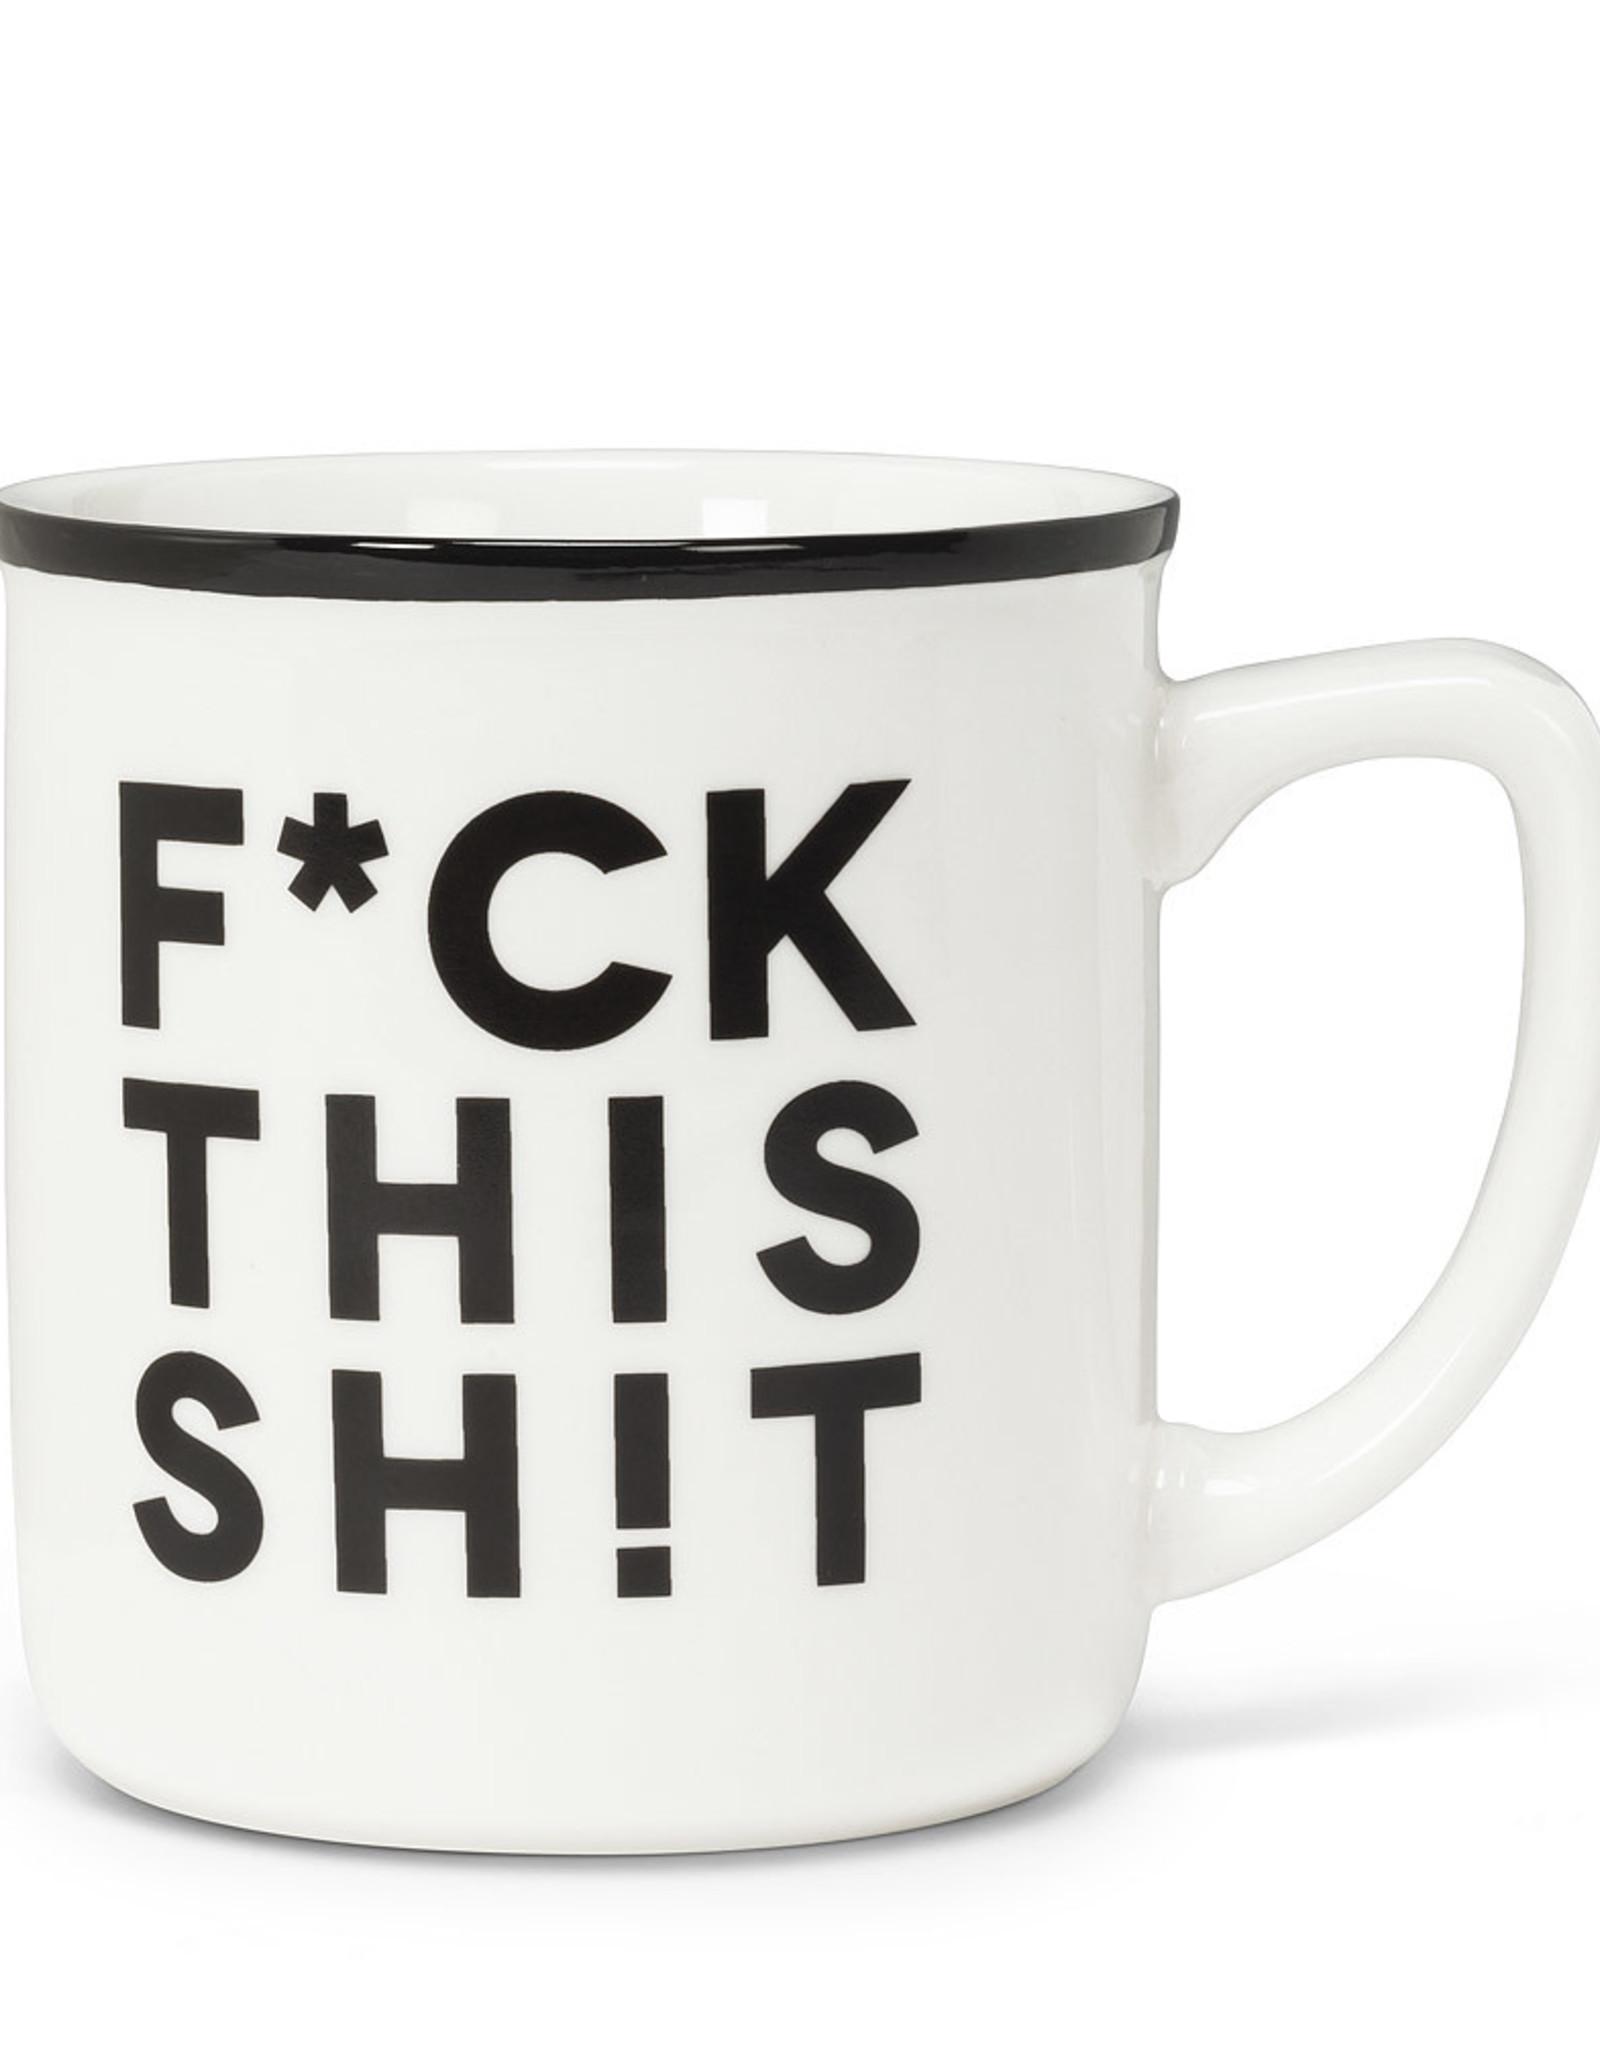 F*ck This Sh!t Mug 14oz.